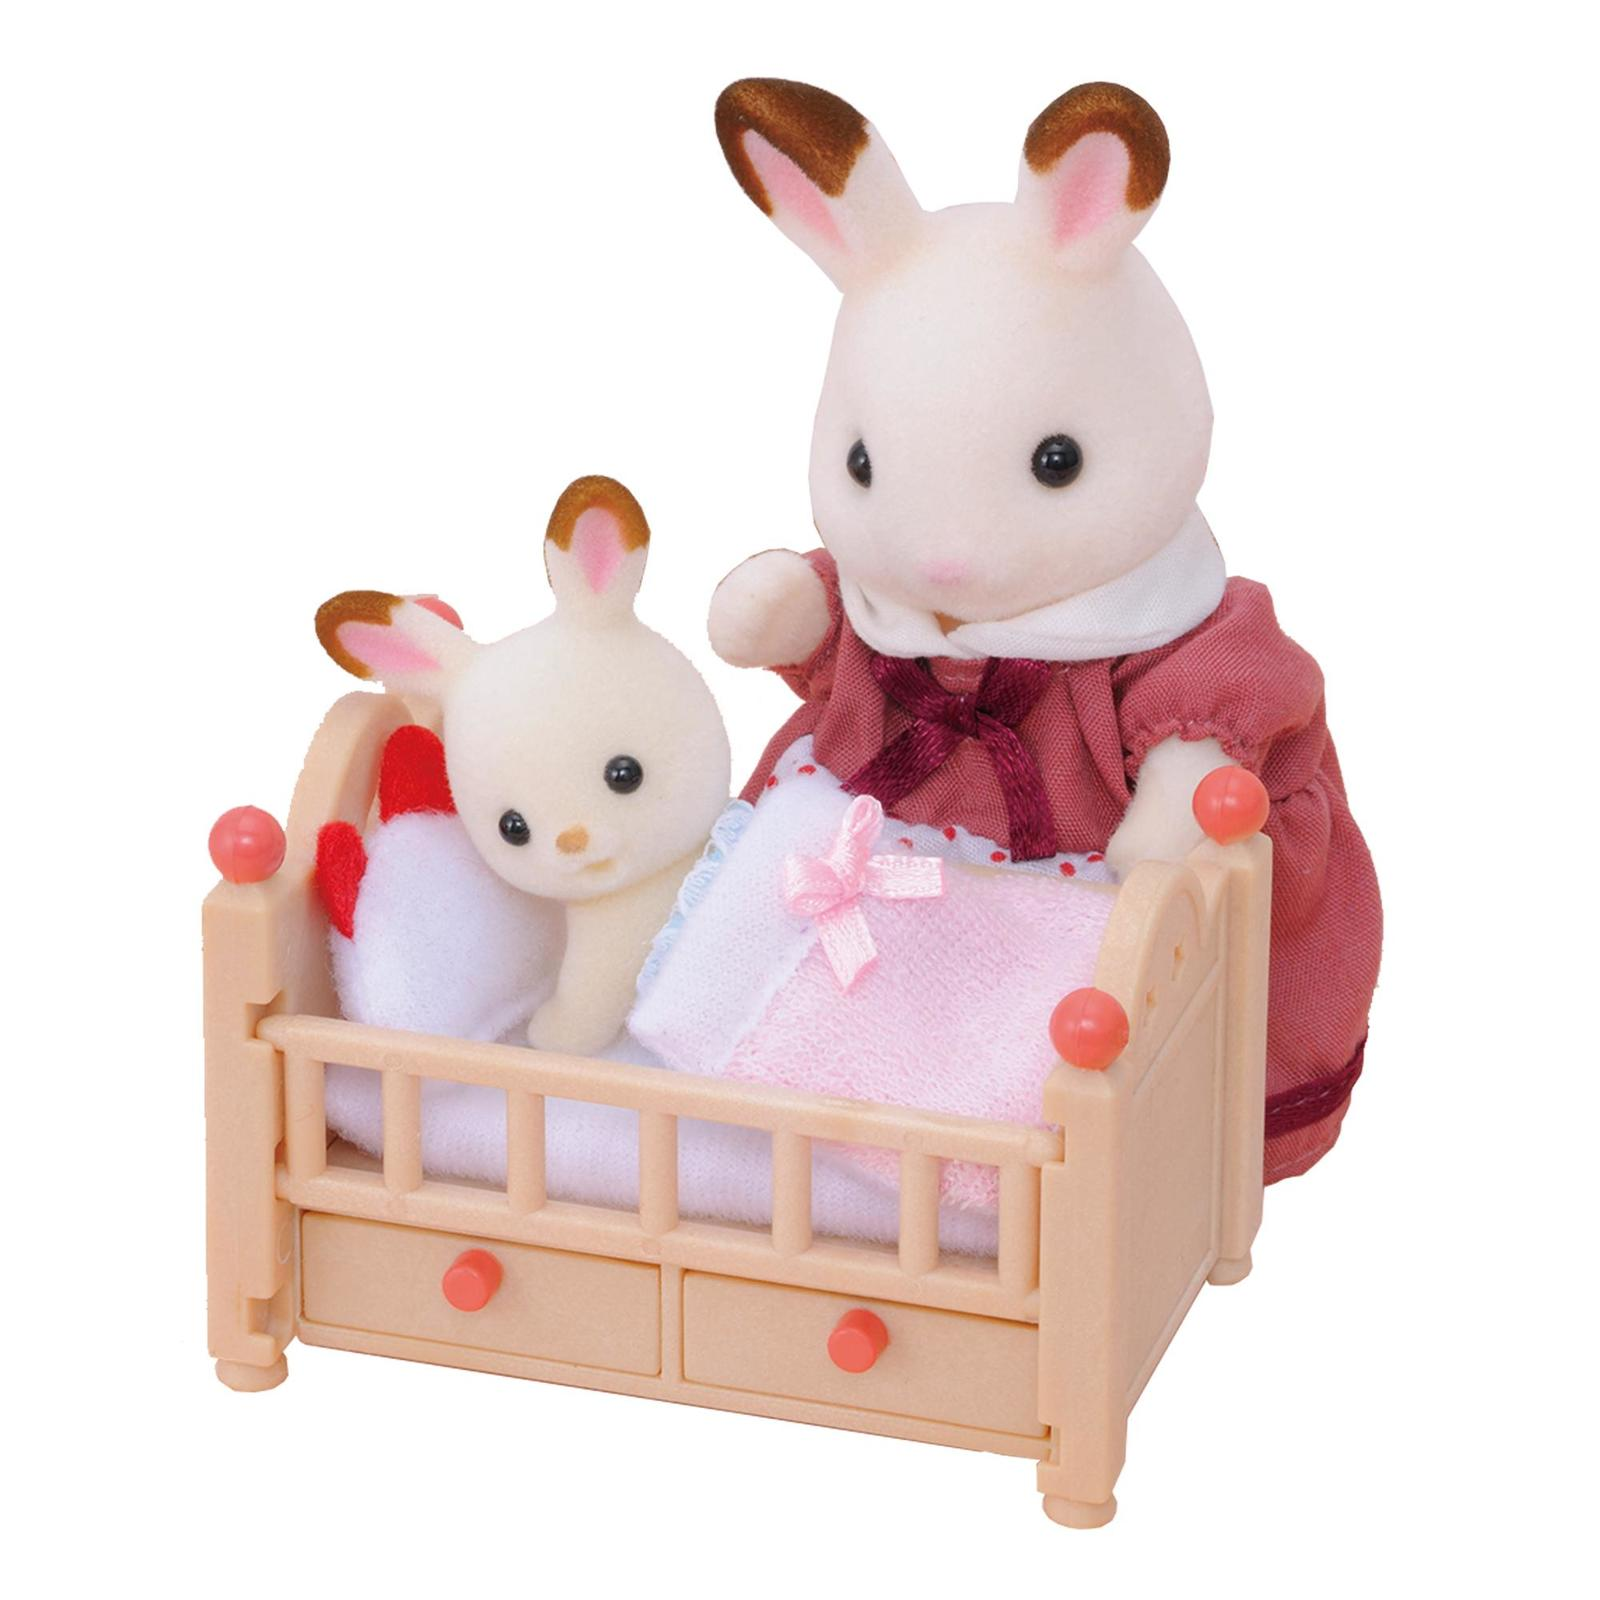 Sylvanian Families: Baby Crib | Toy | at Mighty Ape Australia